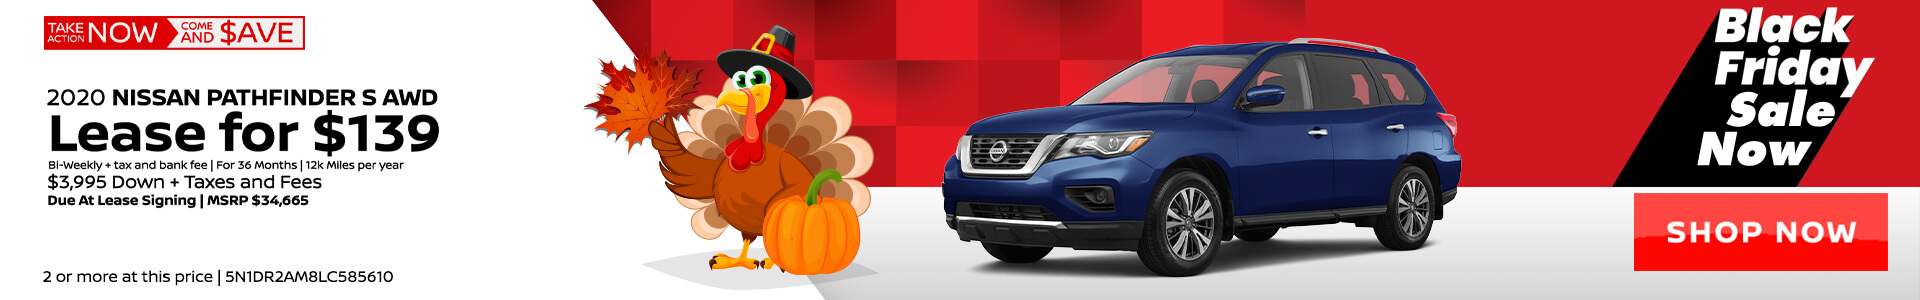 Nissan Pathfinder $139 Lease